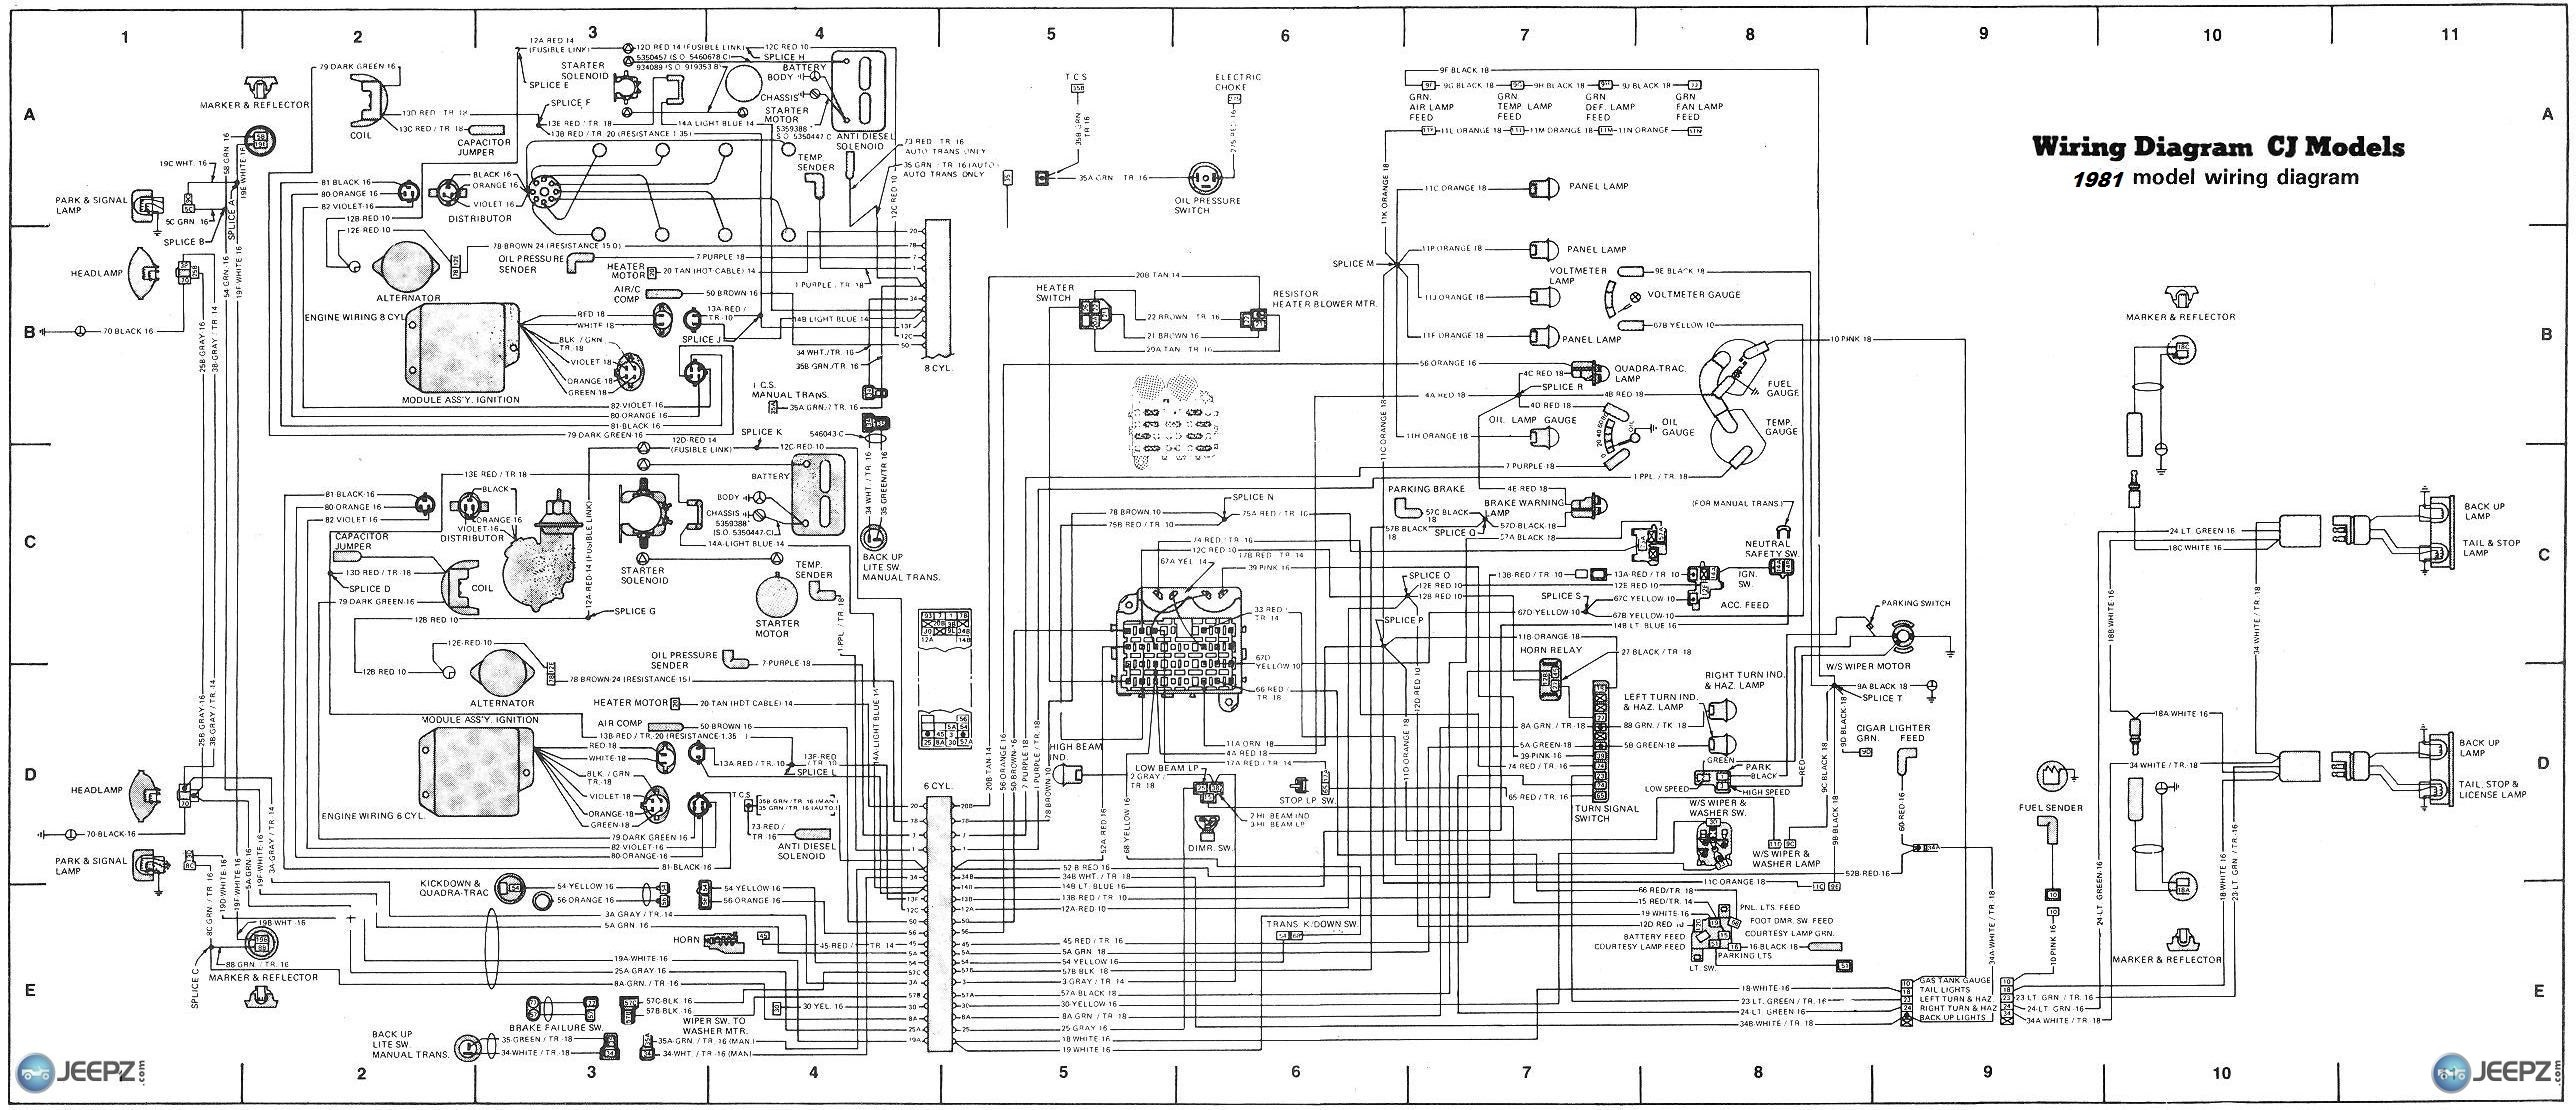 fuse box diagram for corsa b hs 4959  opel zafira b wiring diagram free diagram  hs 4959  opel zafira b wiring diagram